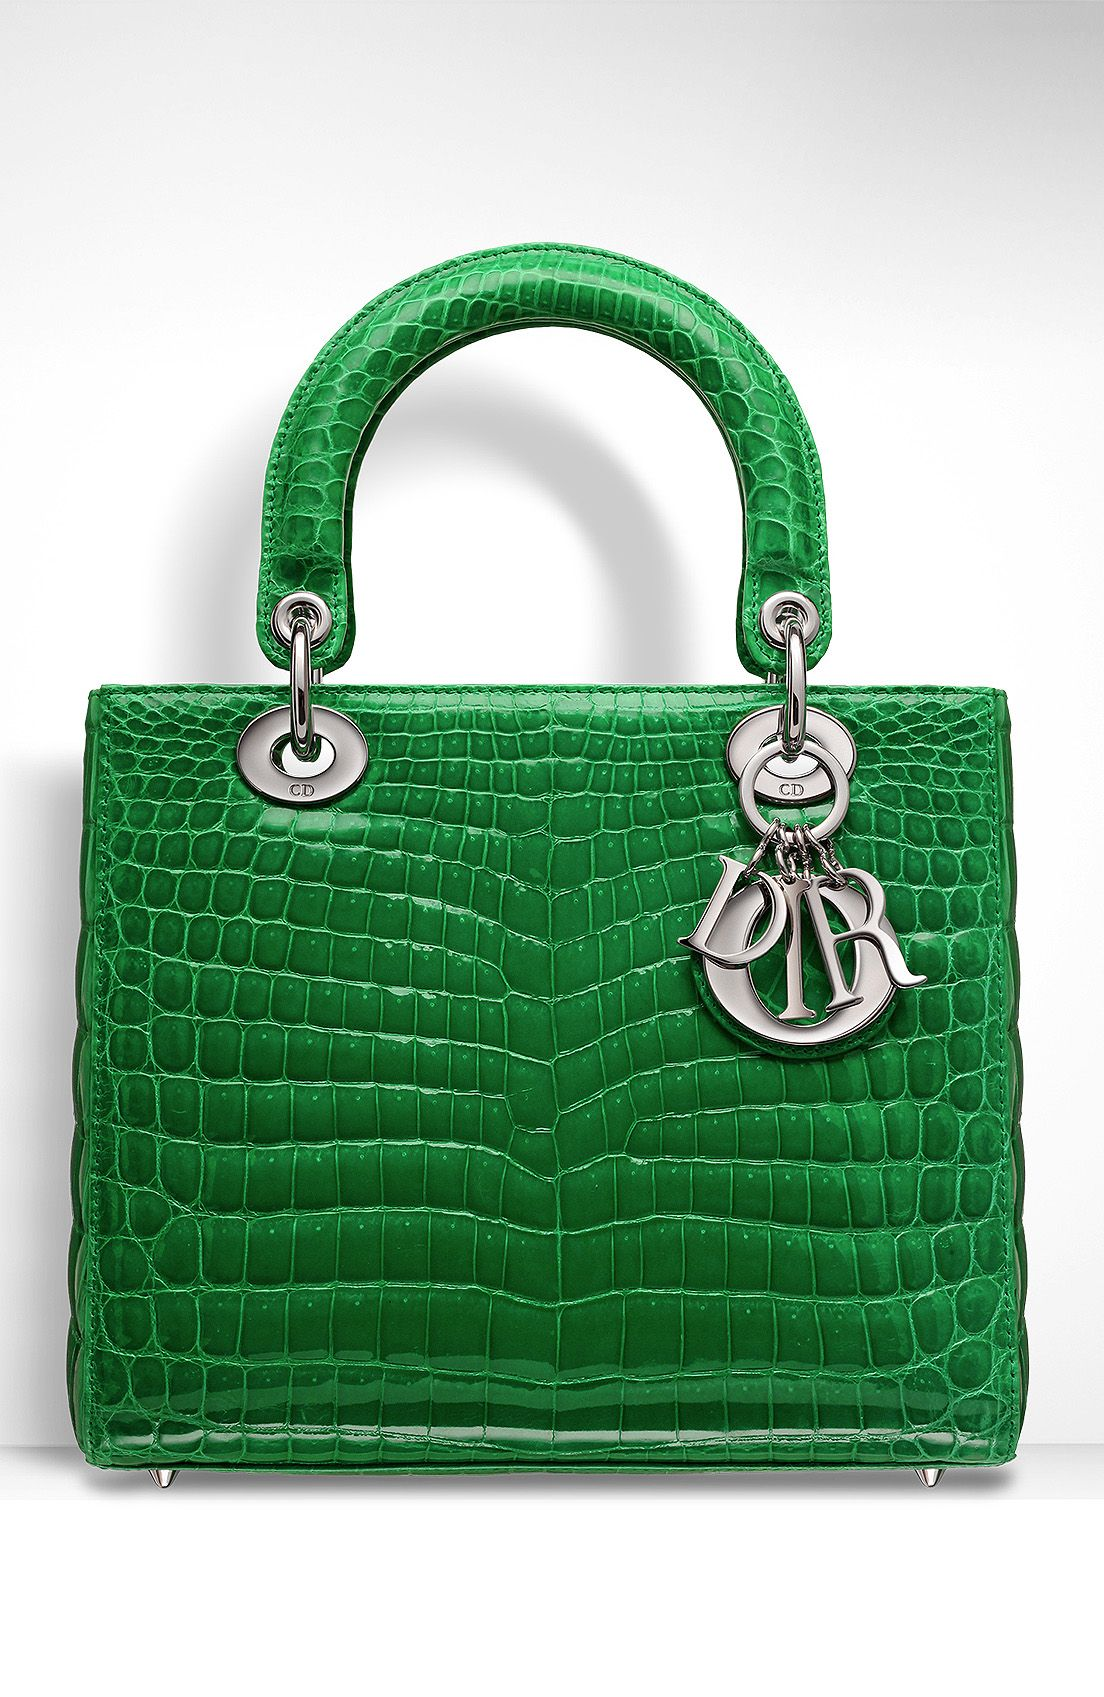 Watch - Dior lady crocodile pattern bag sale video